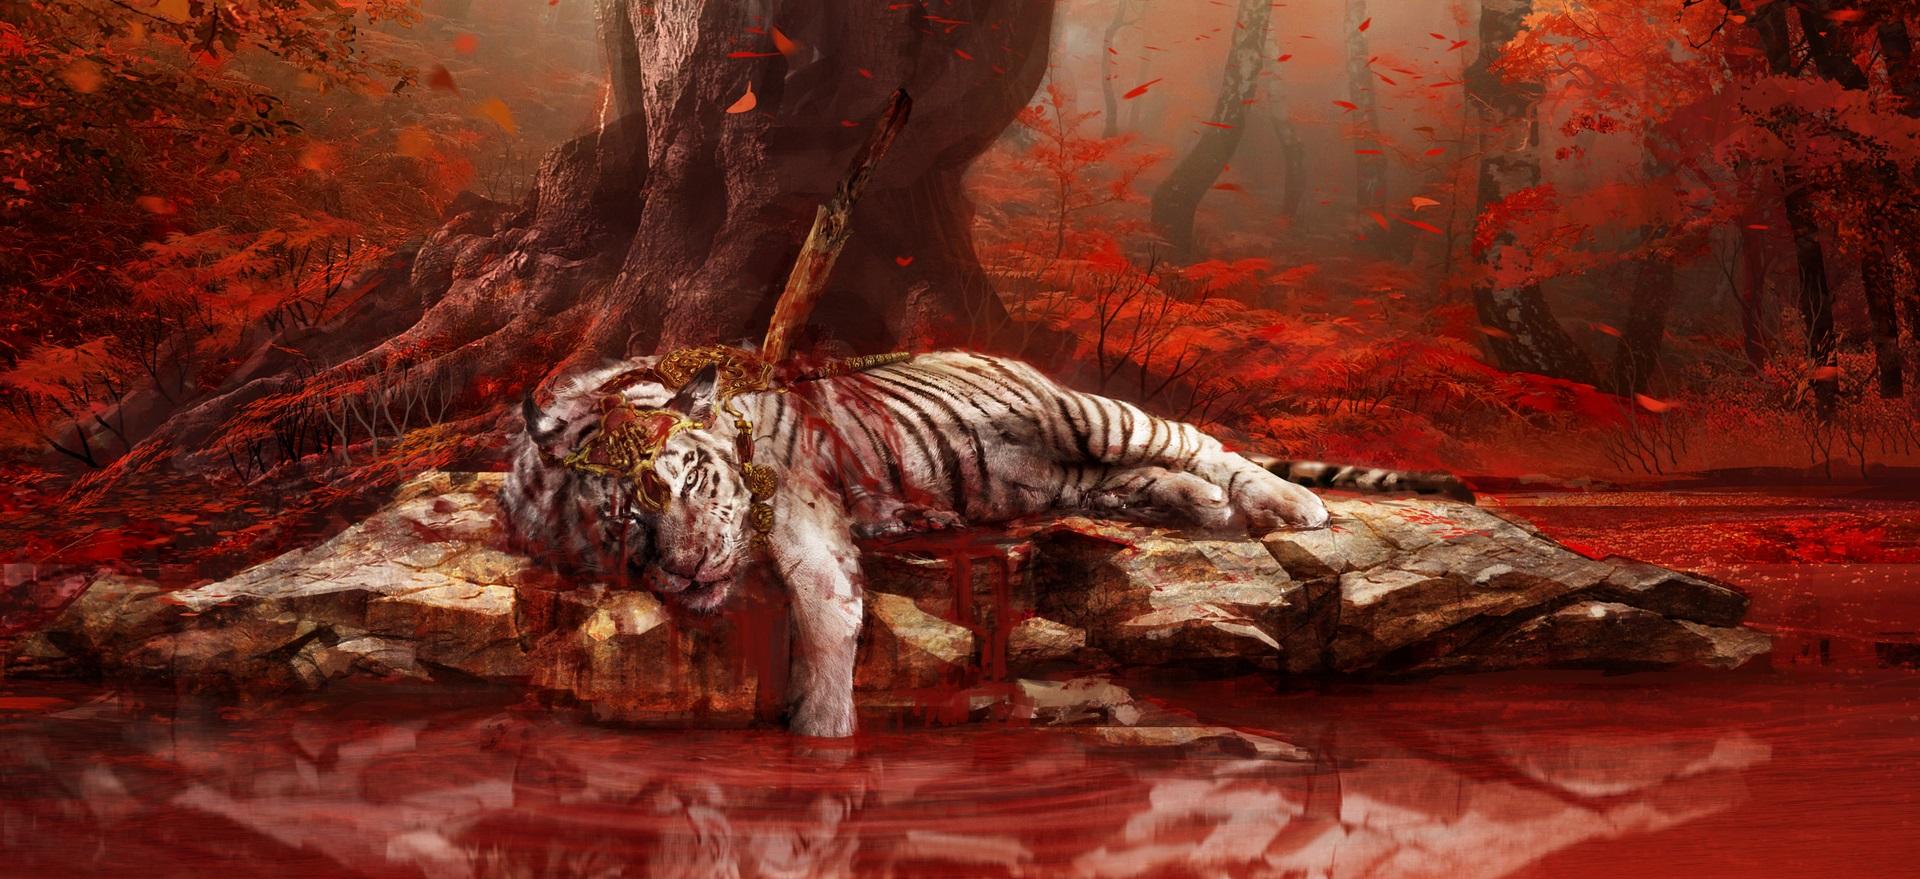 Shangri la injured tiger artwork